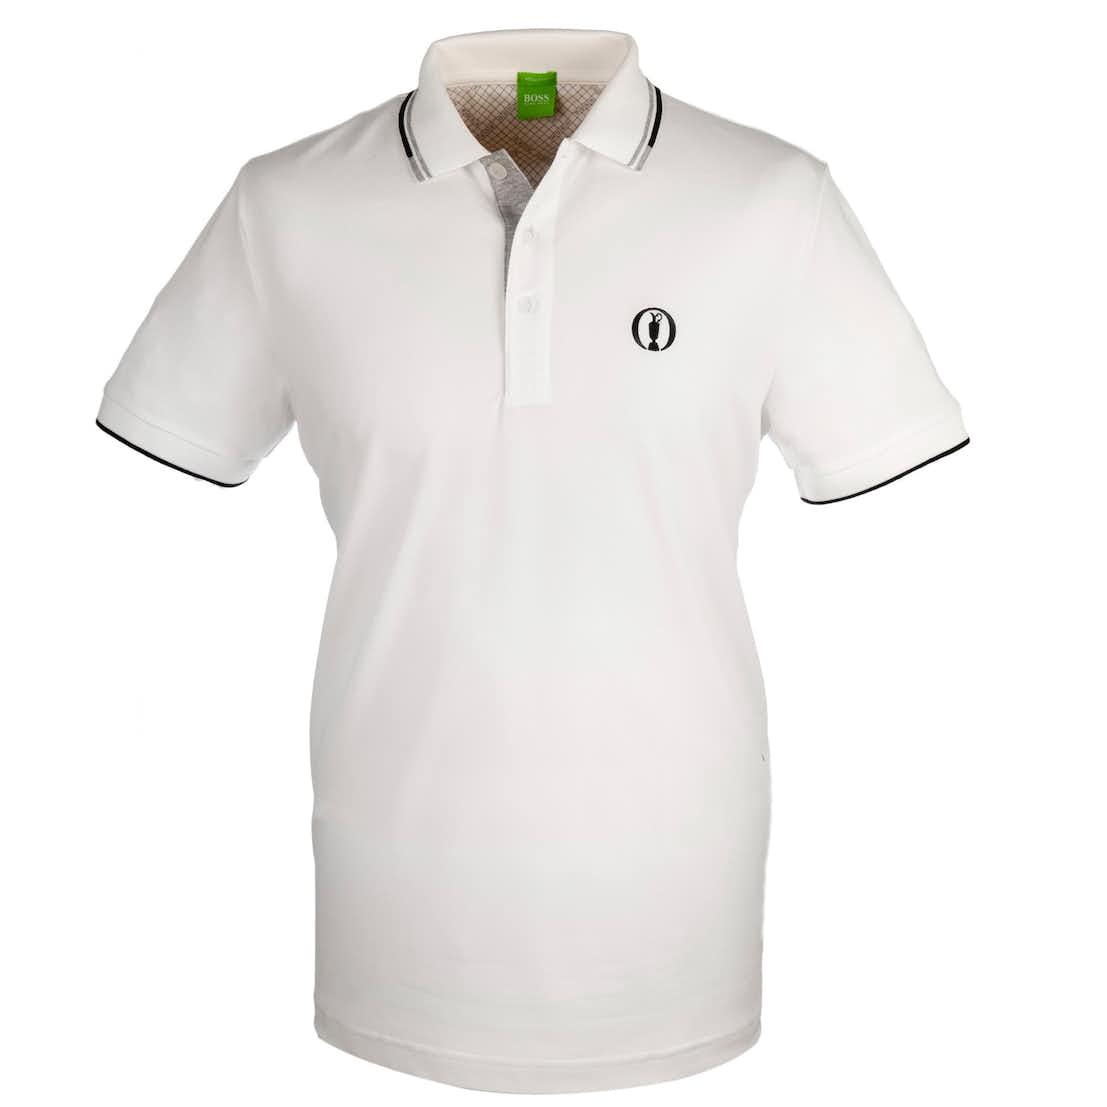 The Open BOSS Paddy Pro Plain Polo - White